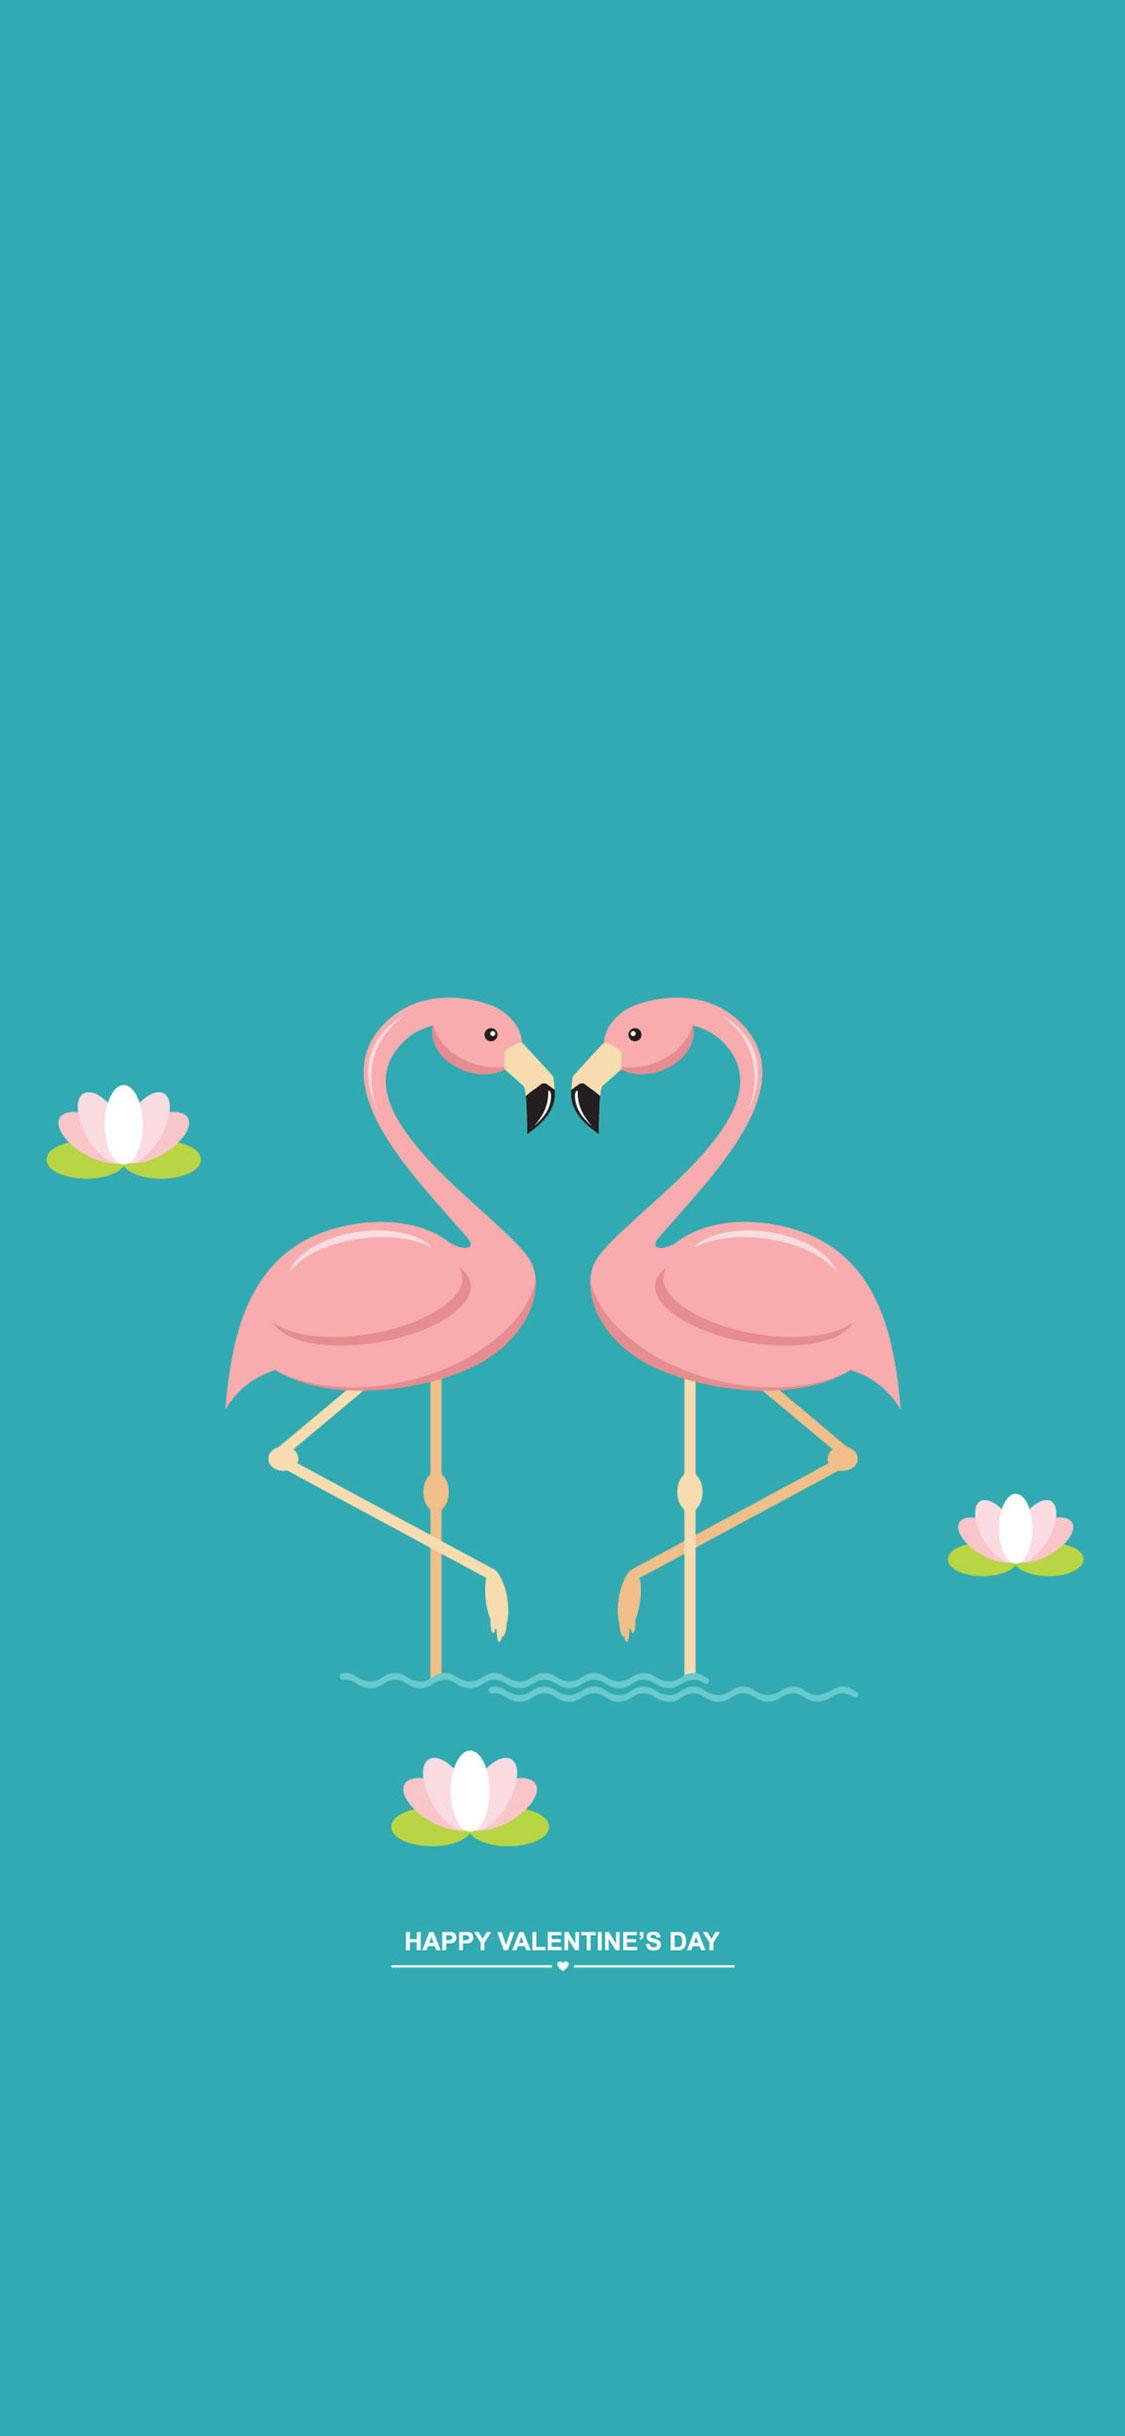 Flamingo Illustration 1125x2436 Wallpaper Teahub Io